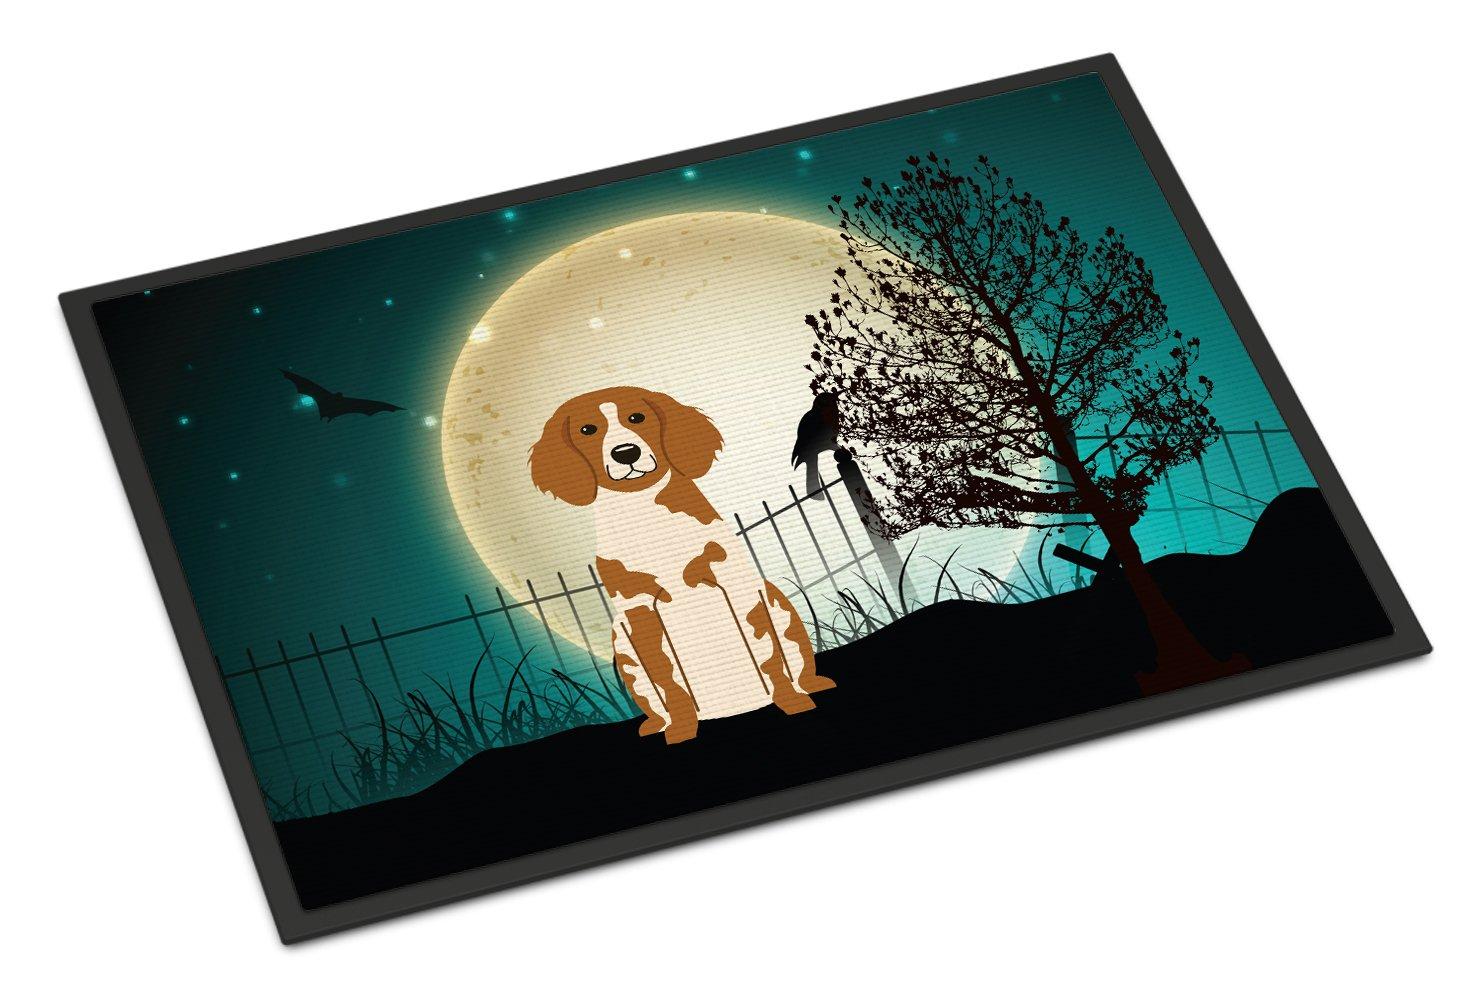 Carolines Treasures Halloween Scary Brittany Spaniel Indoor or Outdoor Mat 24x36 BB2262JMAT 24 x 36 Multicolor